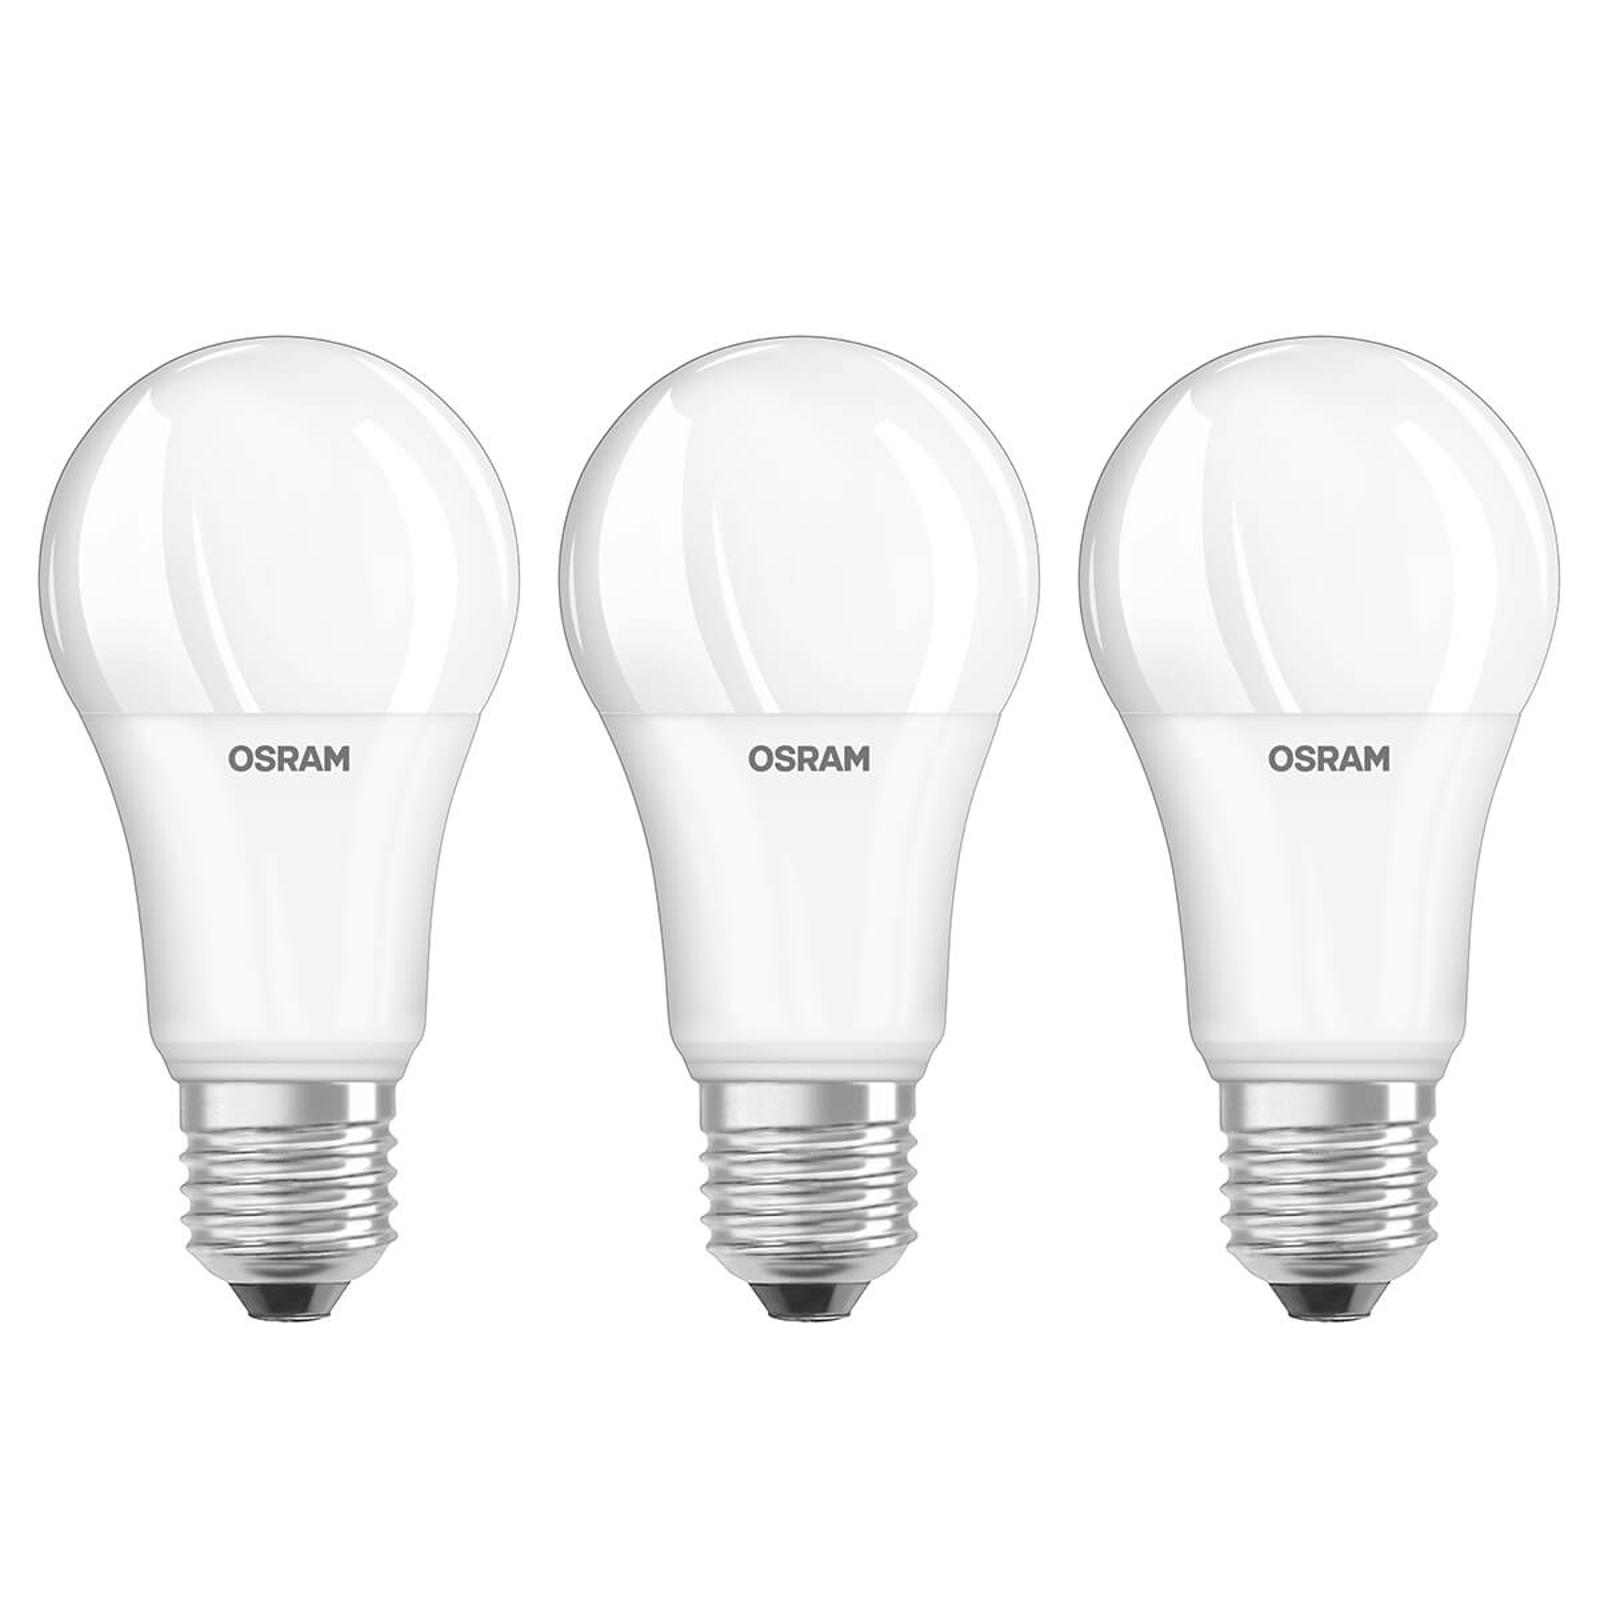 LED-Lampe E27 14W, warmweiß, 3er-Set